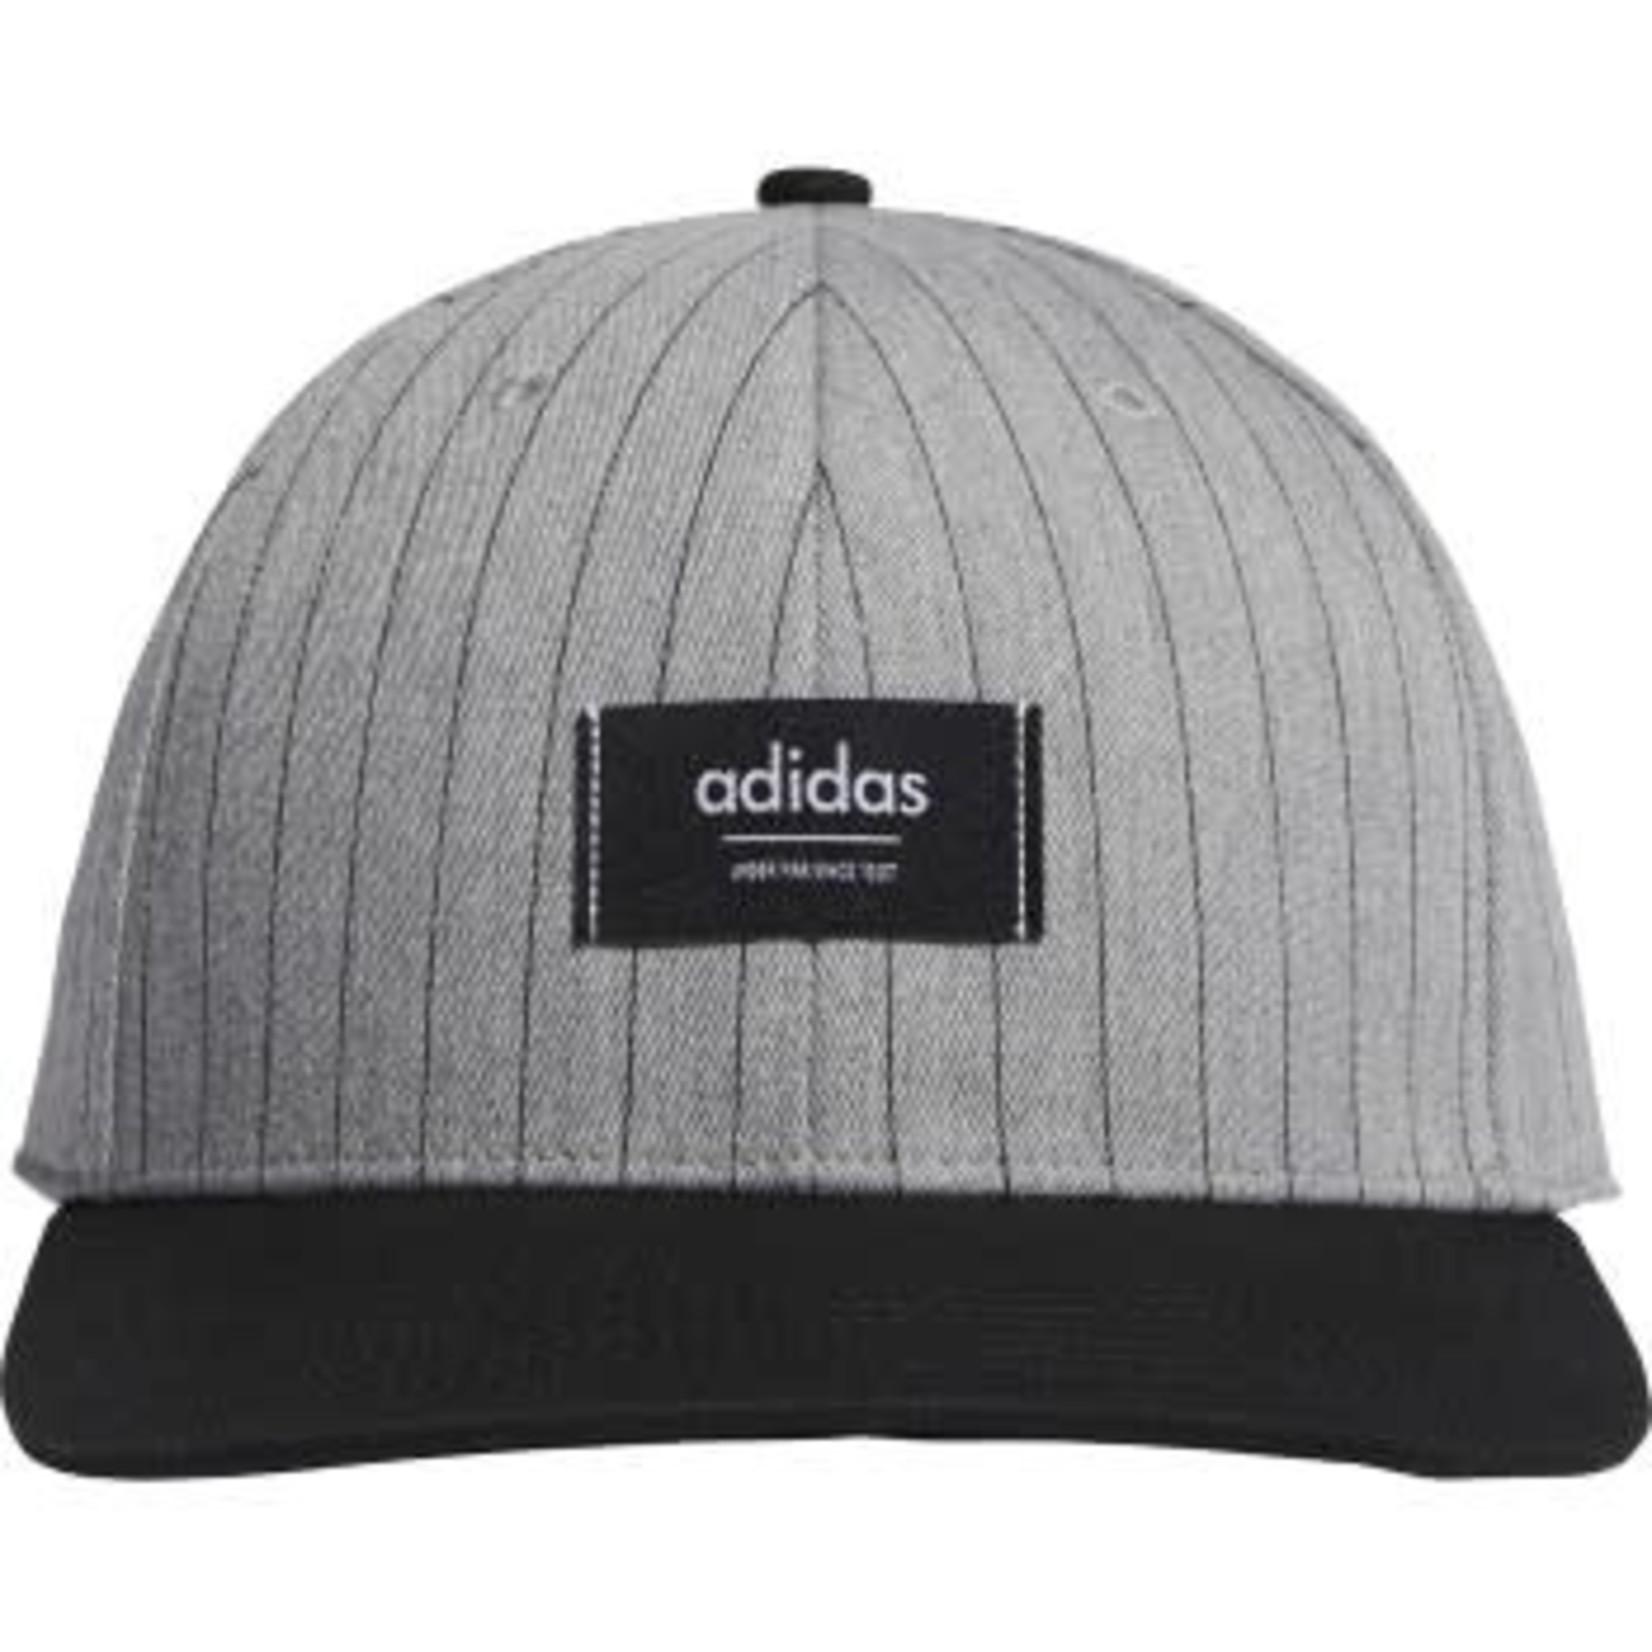 Adidas Pinstripe Hat